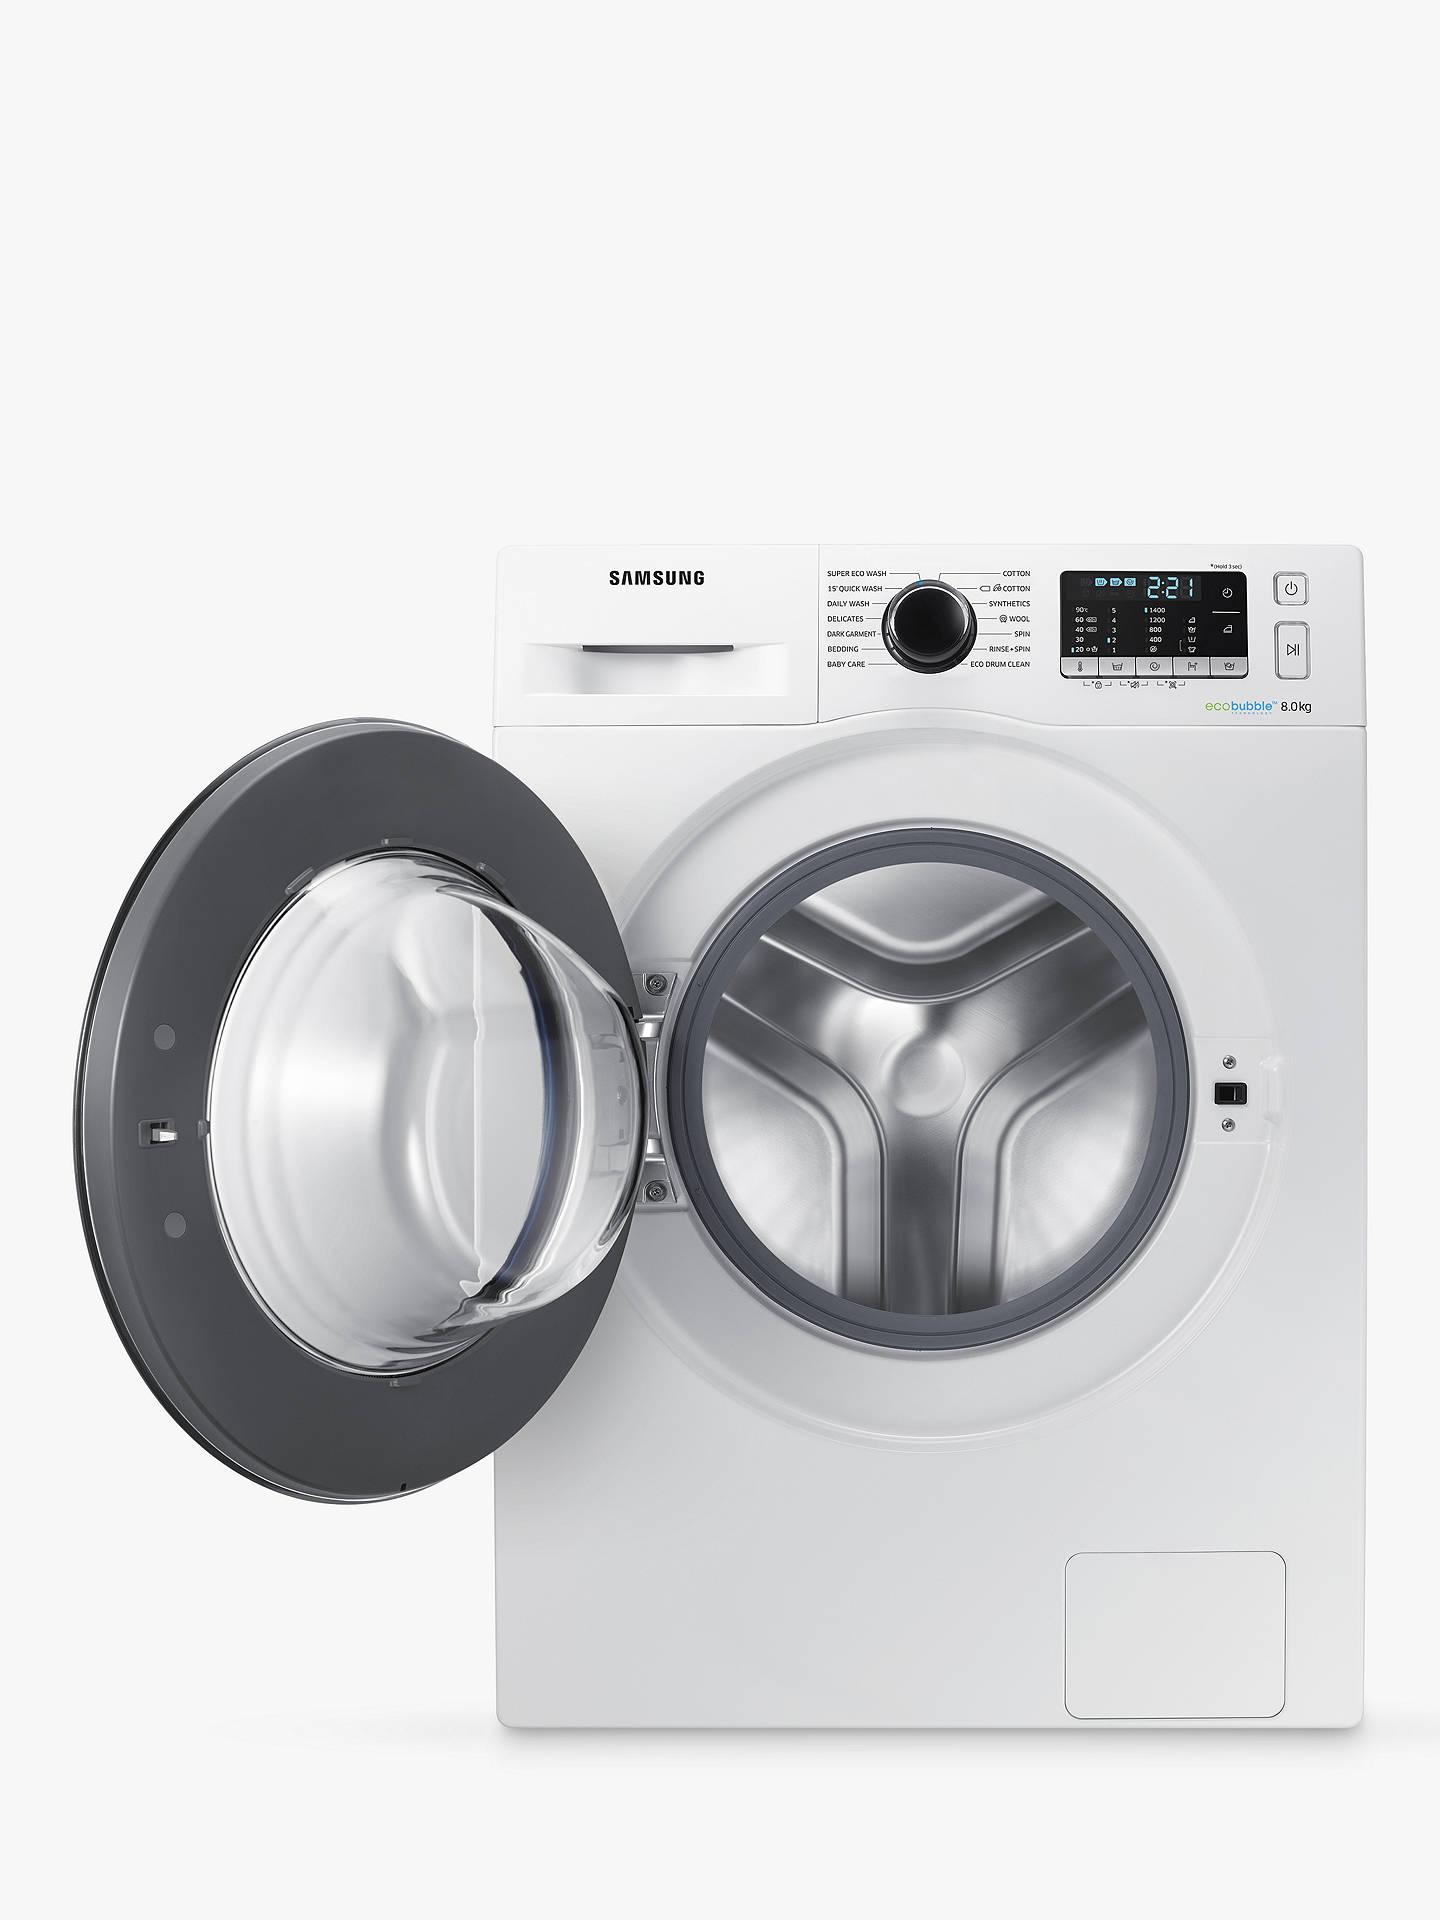 Samsung WW80J5555FW/EU ecobubble Freestanding Washing Machine, 8kg Load,  A+++ Energy Rating, 1400rpm Spin, White